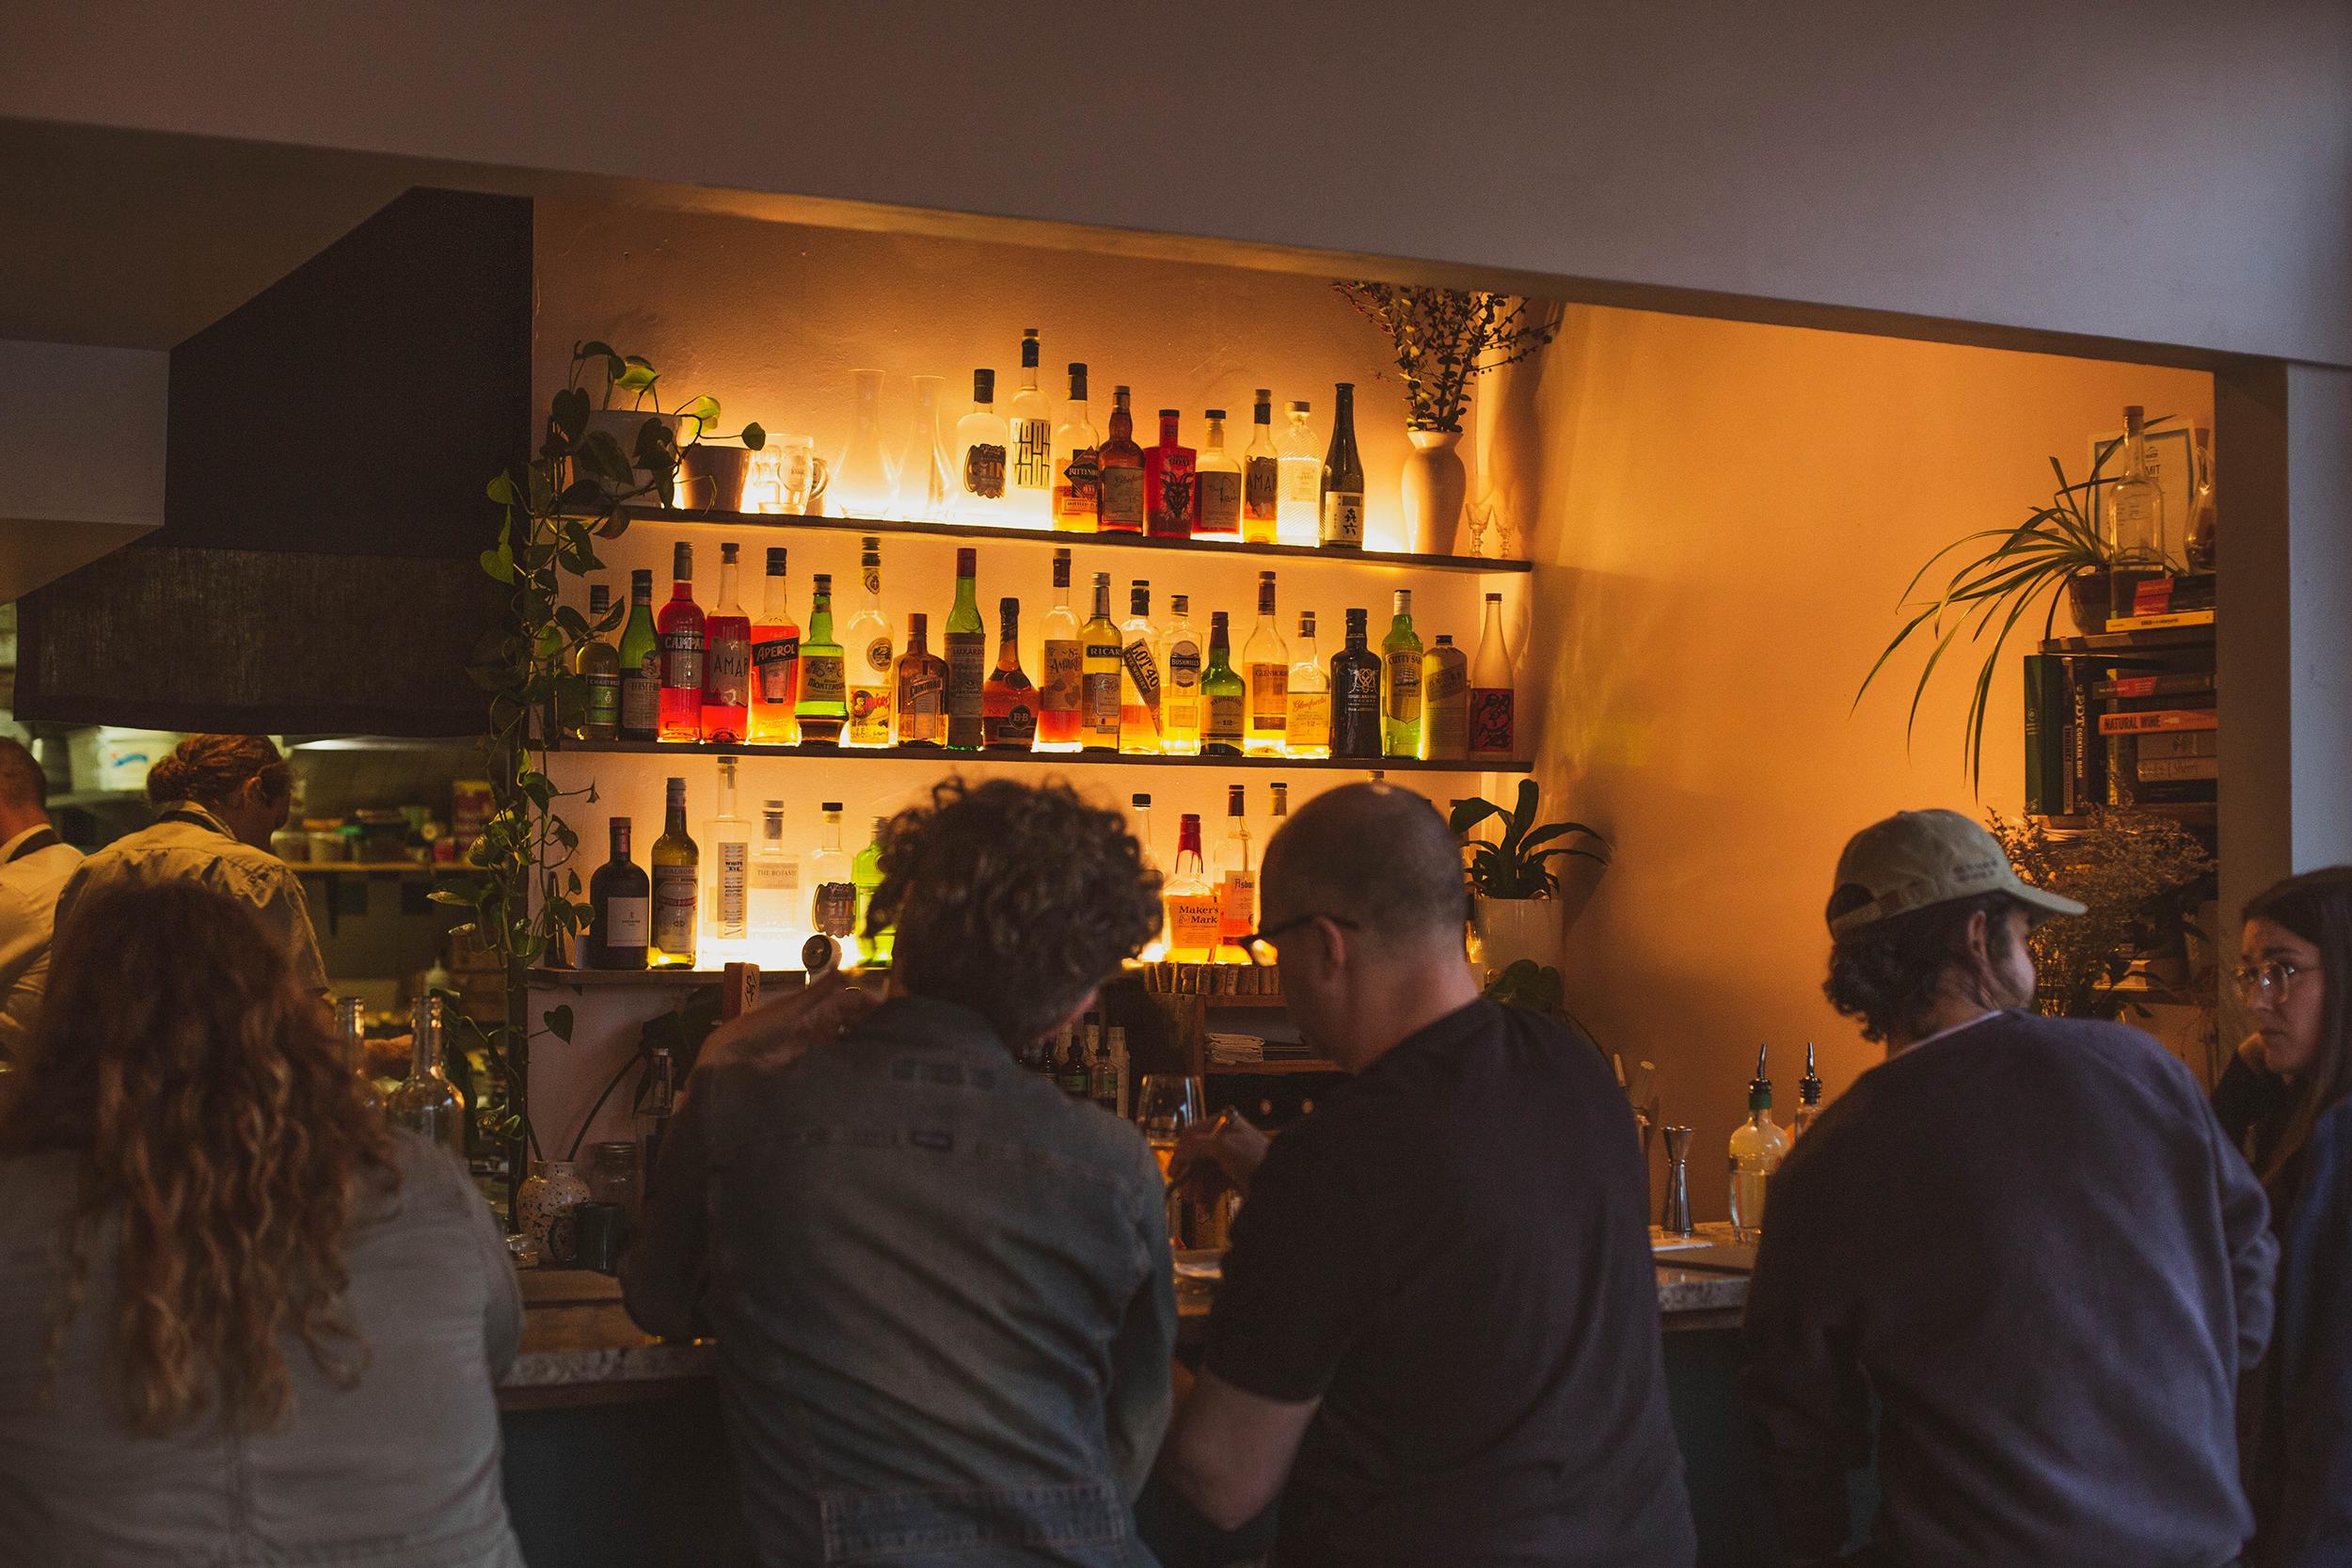 Guests enjoying Whiteside's Northern Ireland inspired bar.